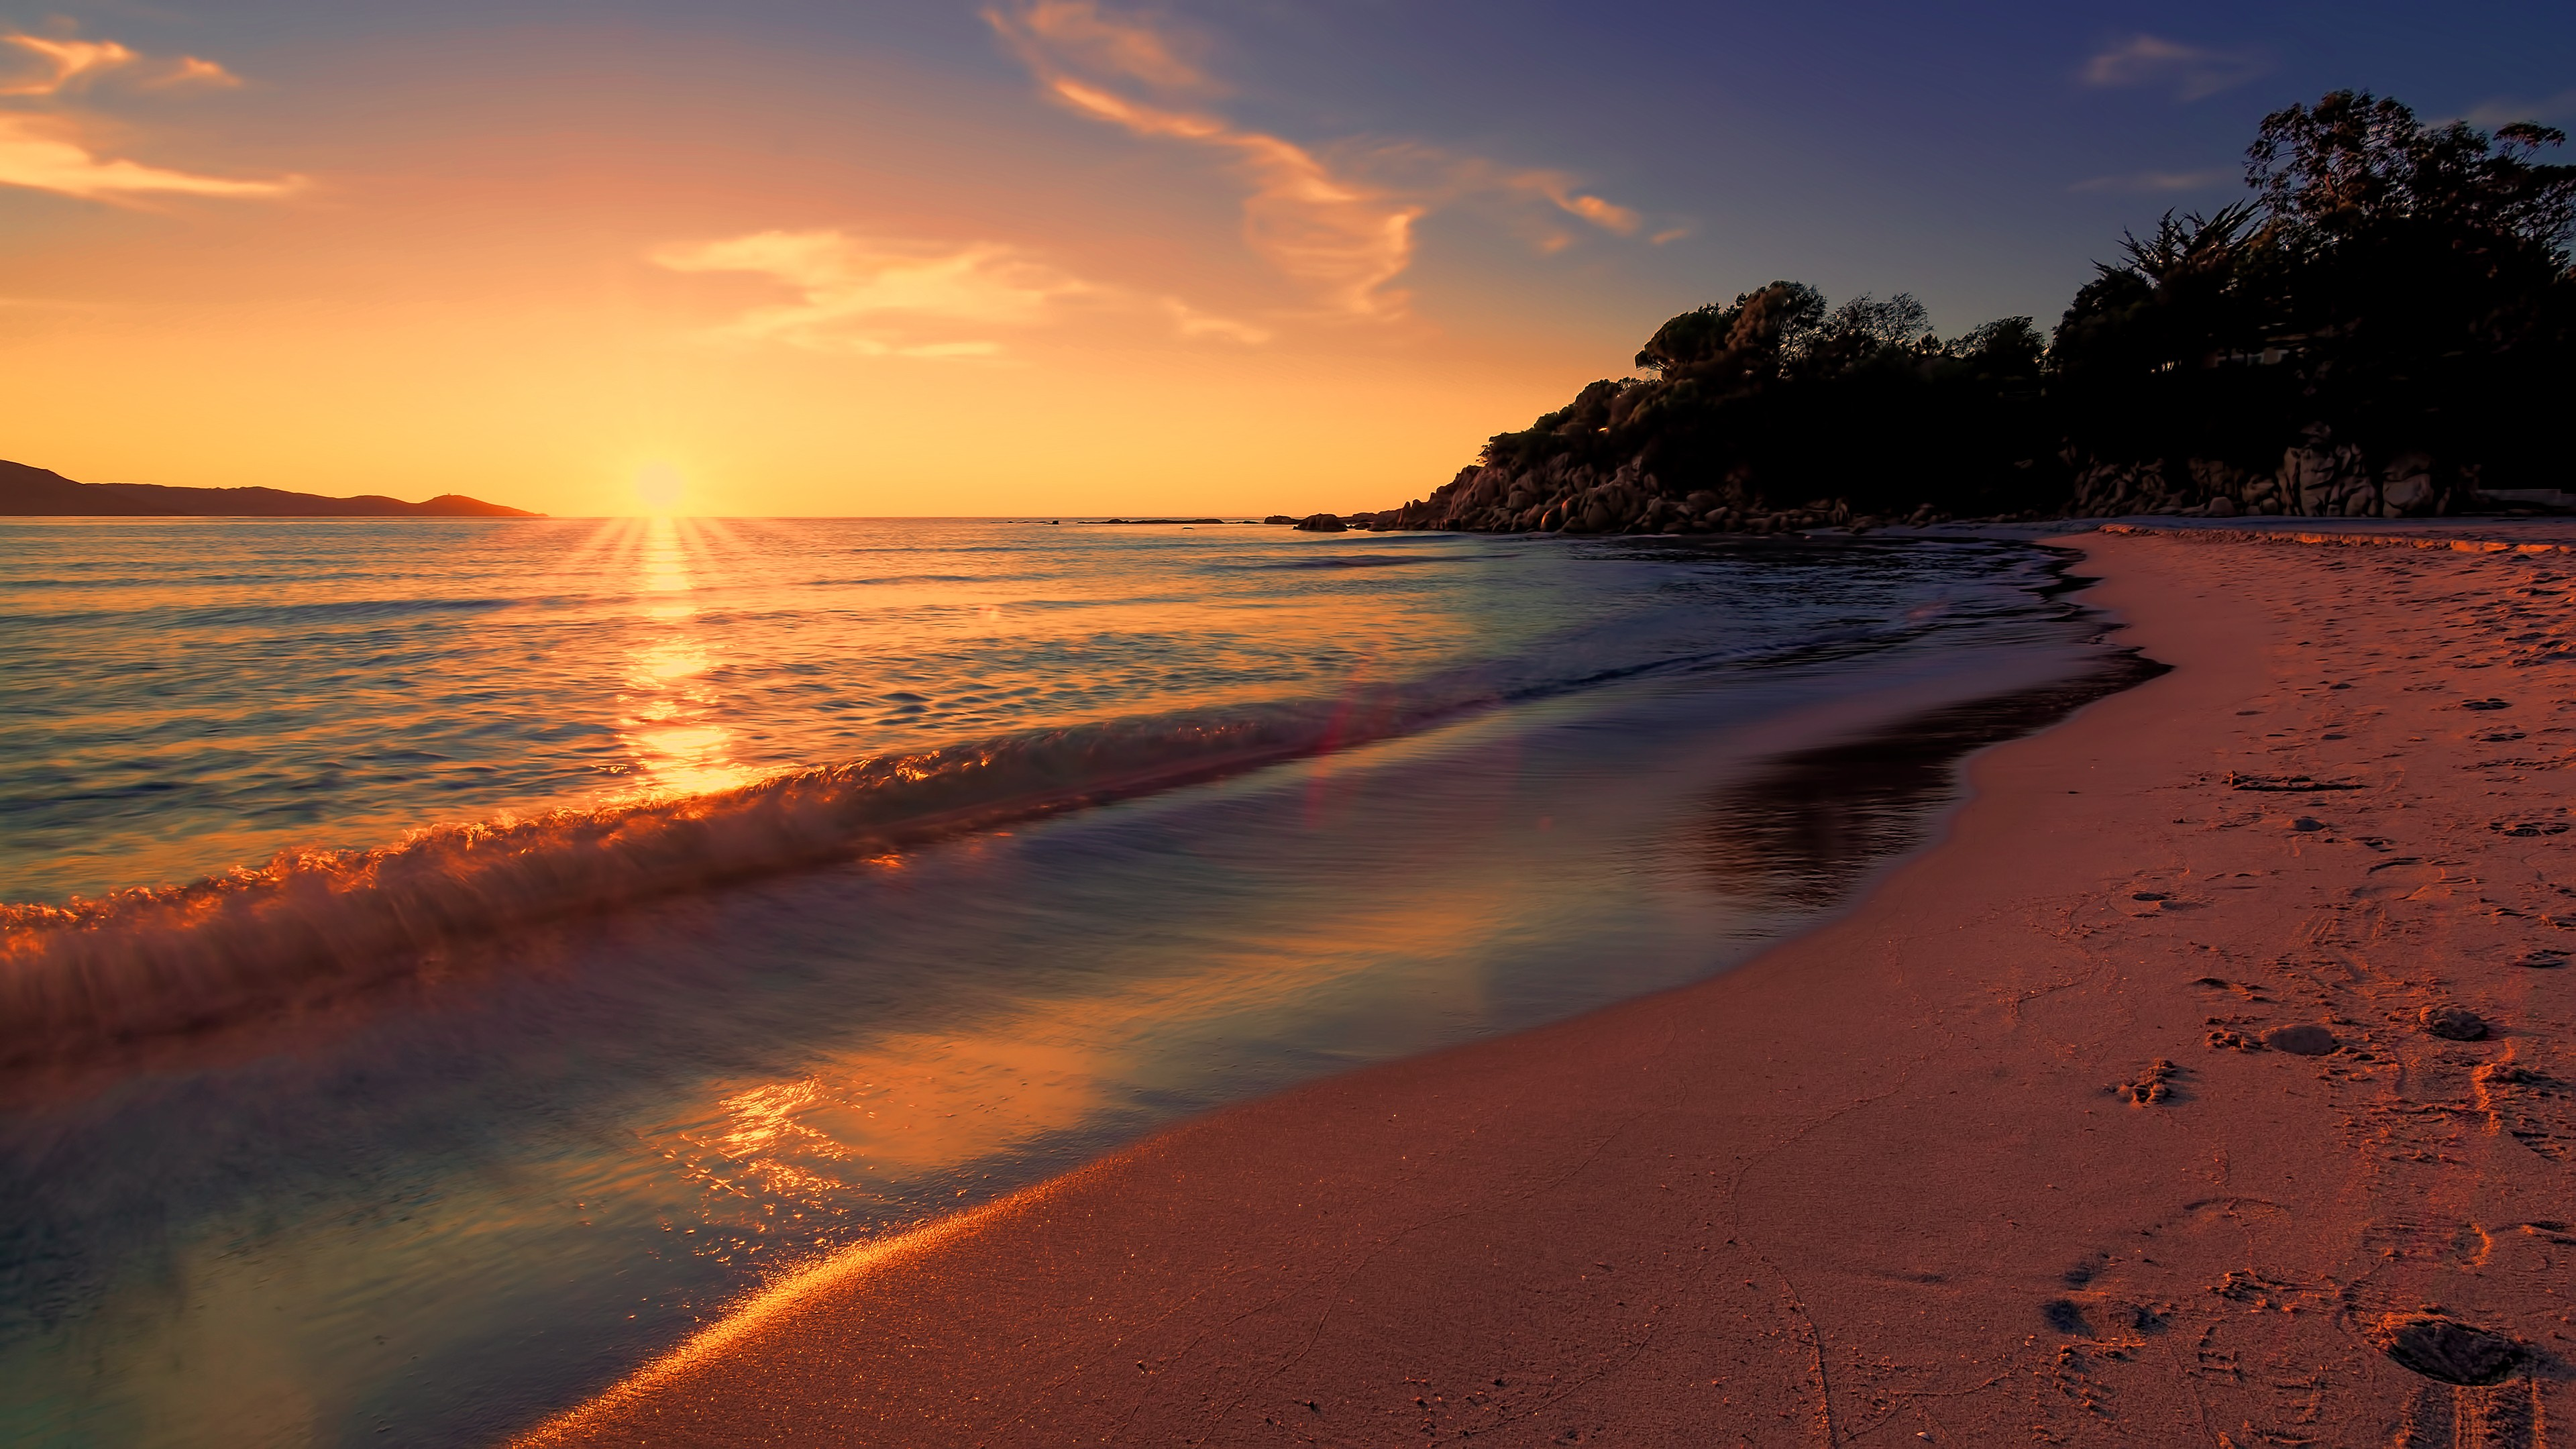 Delightful Nature Beach Wwallpaper: 1336x768 Nature Beach Laptop HD HD 4k Wallpapers, Images